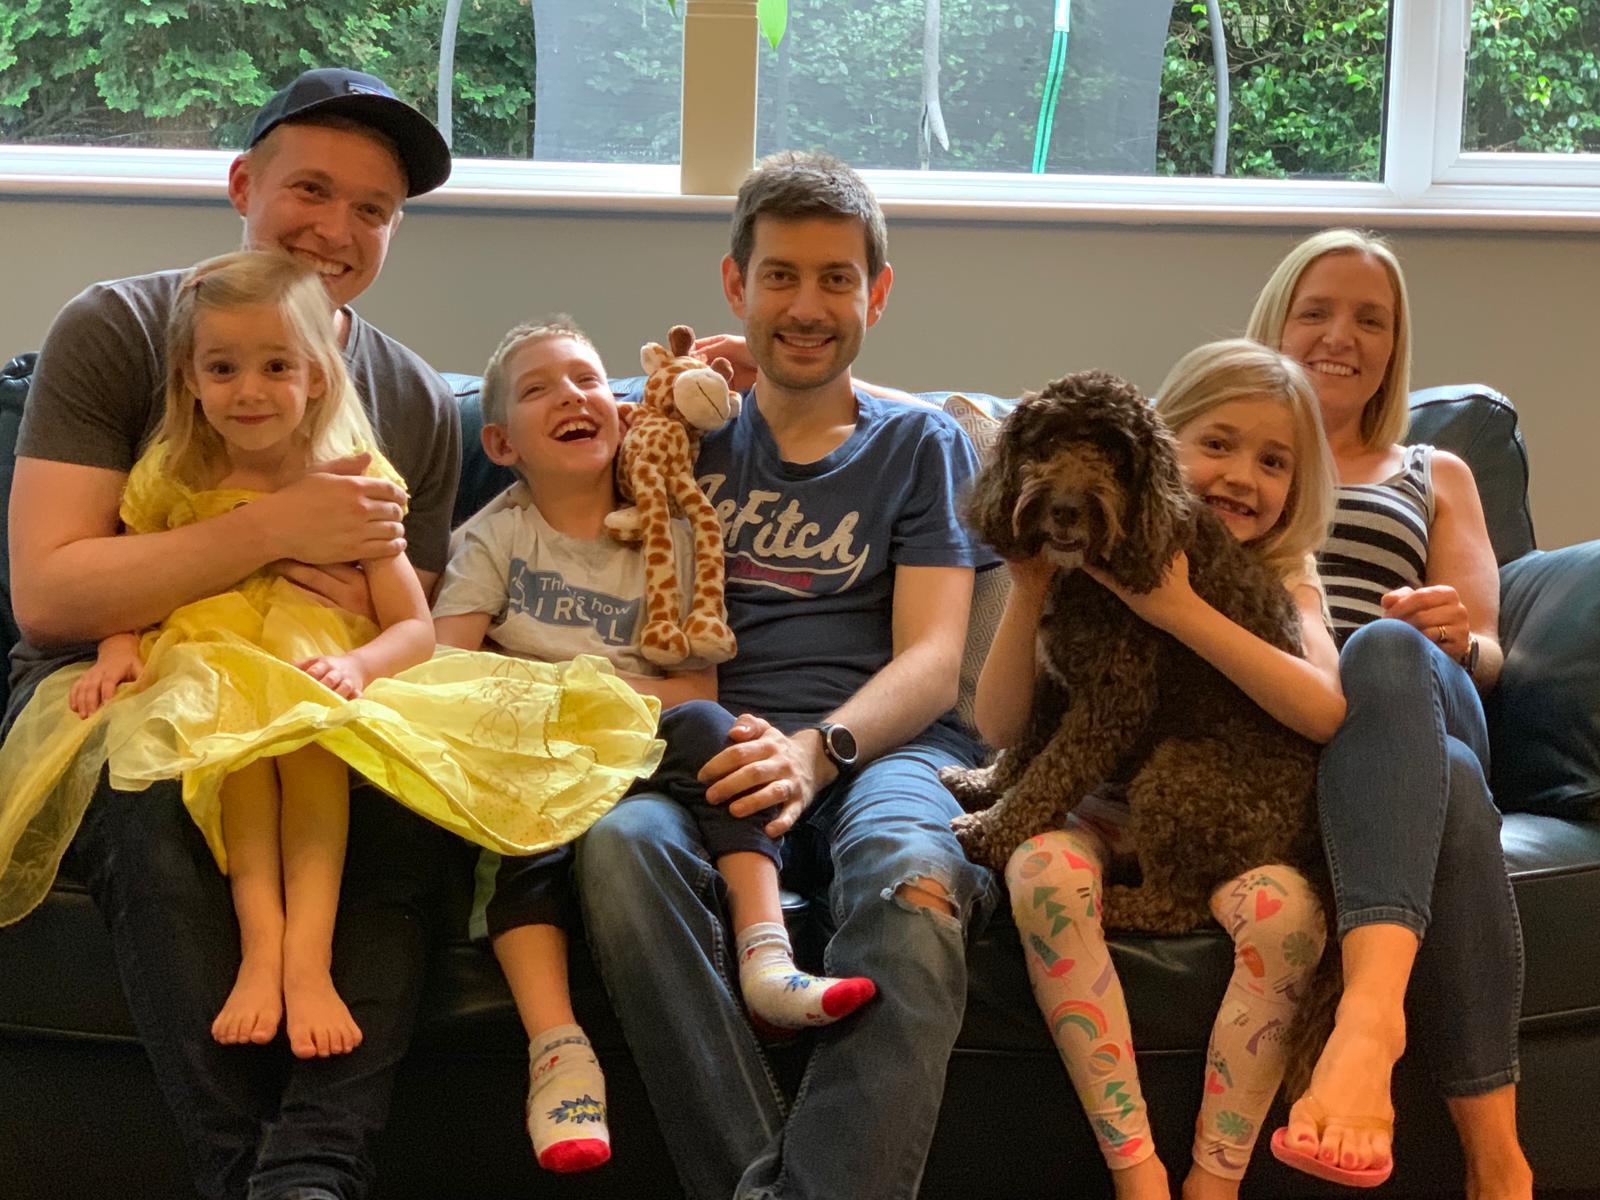 Petts Wood family to run half marathon for The Maypole Project